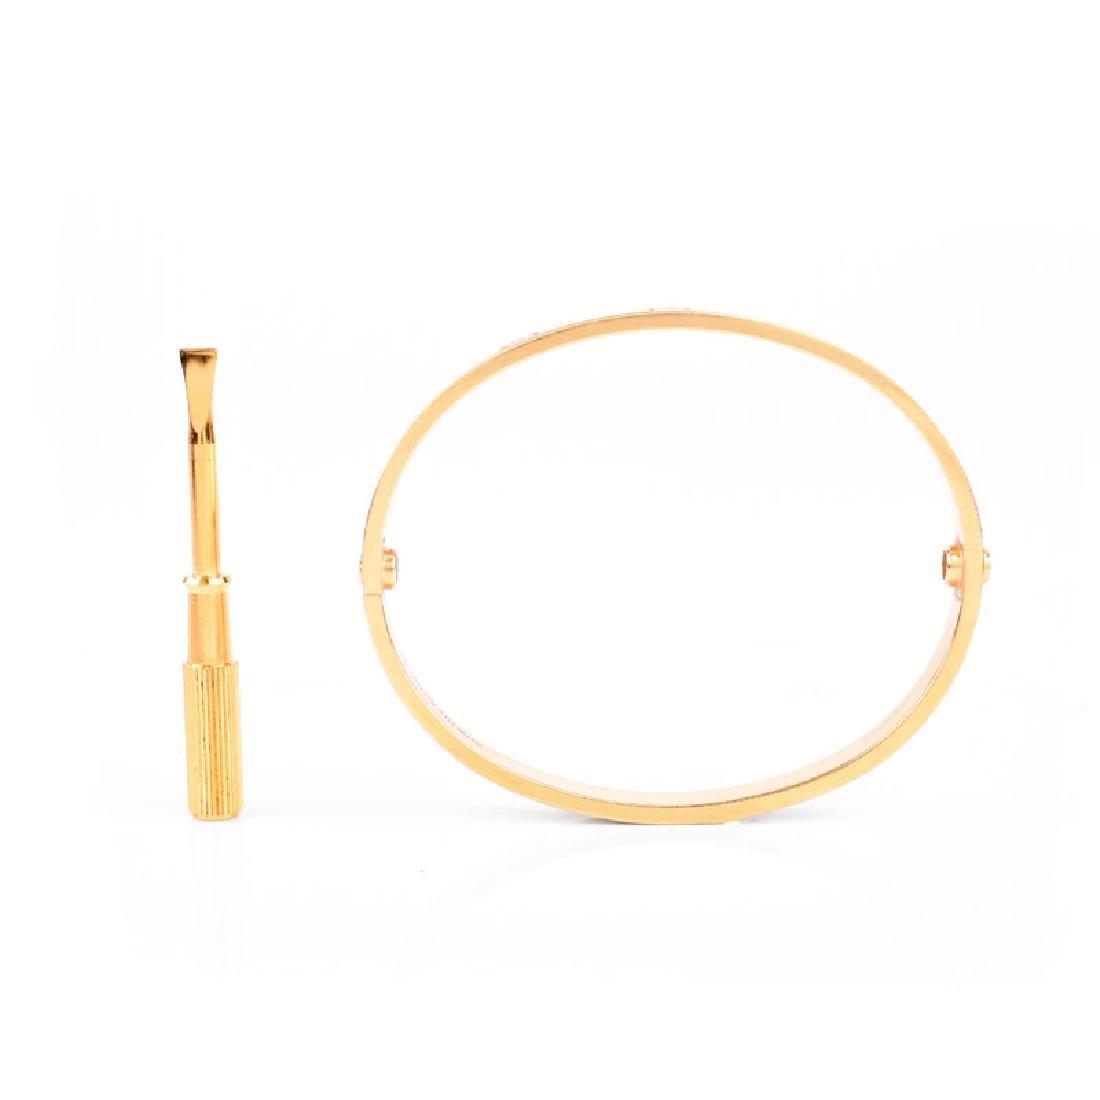 Circa 2014 Cartier 18 Karat Yellow Gold Love Bracelet - 4